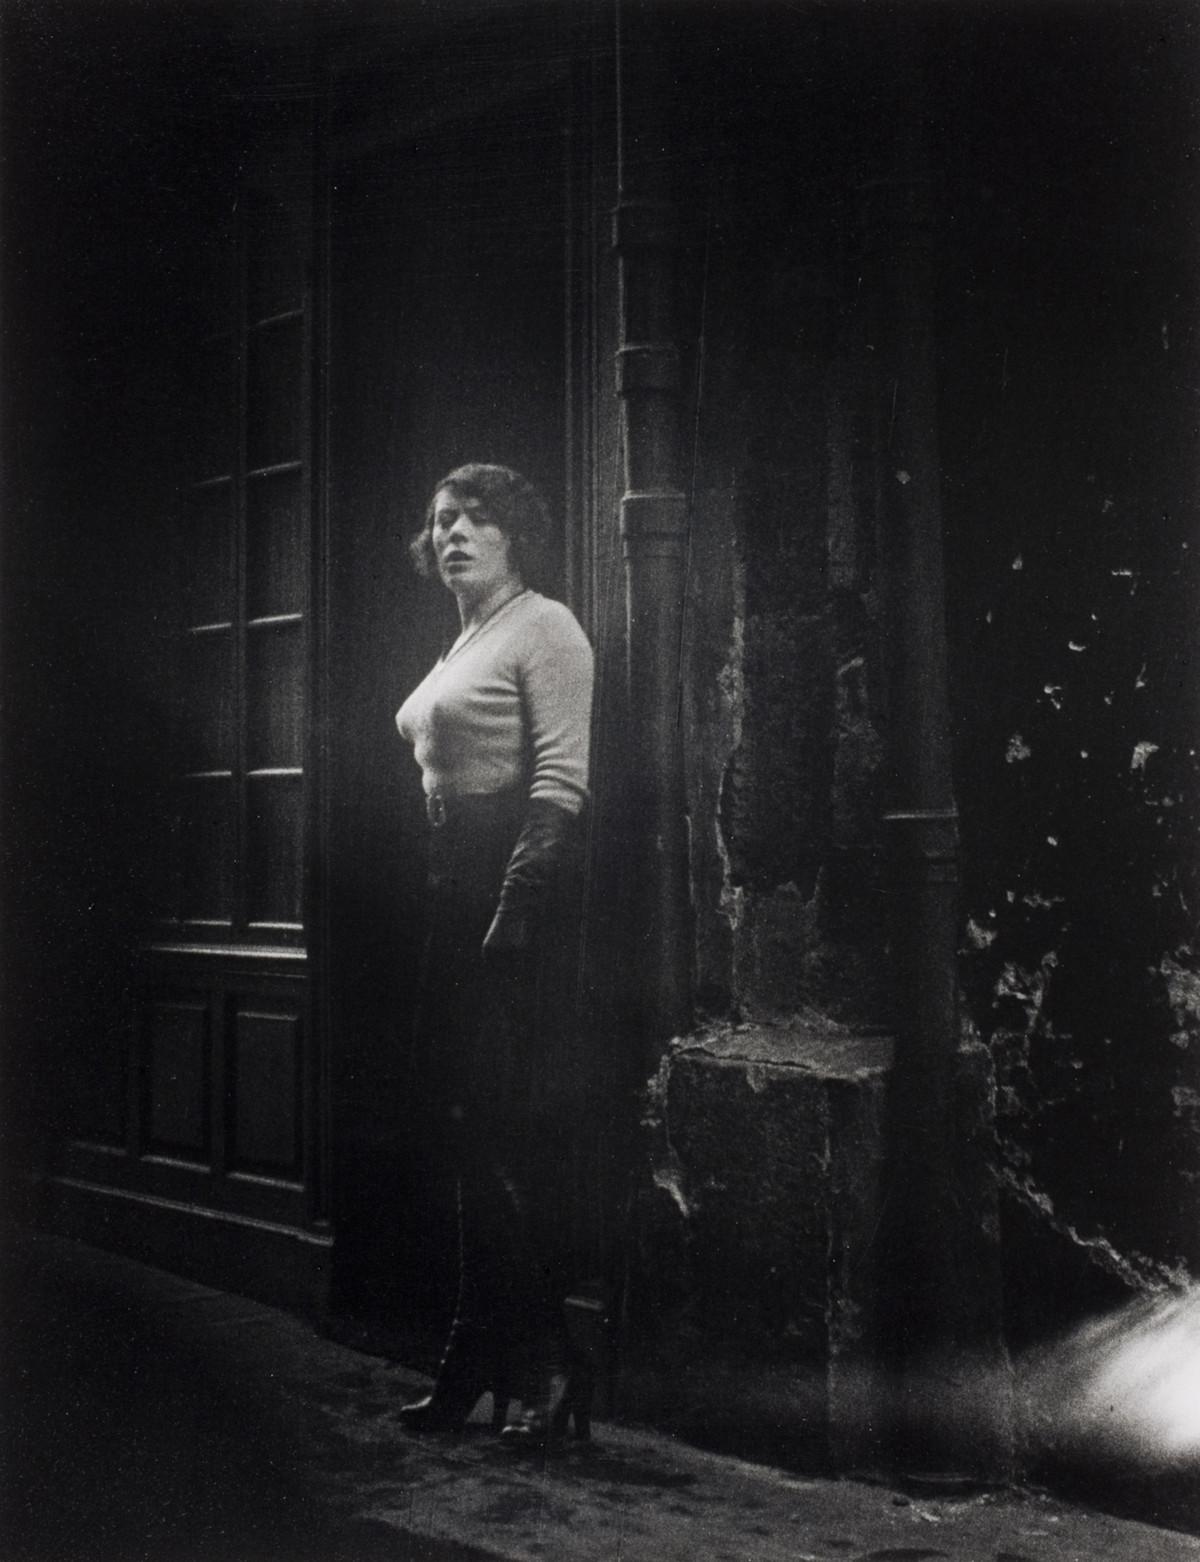 A prostitute on the rue Saint-Denis in Paris, 1932.